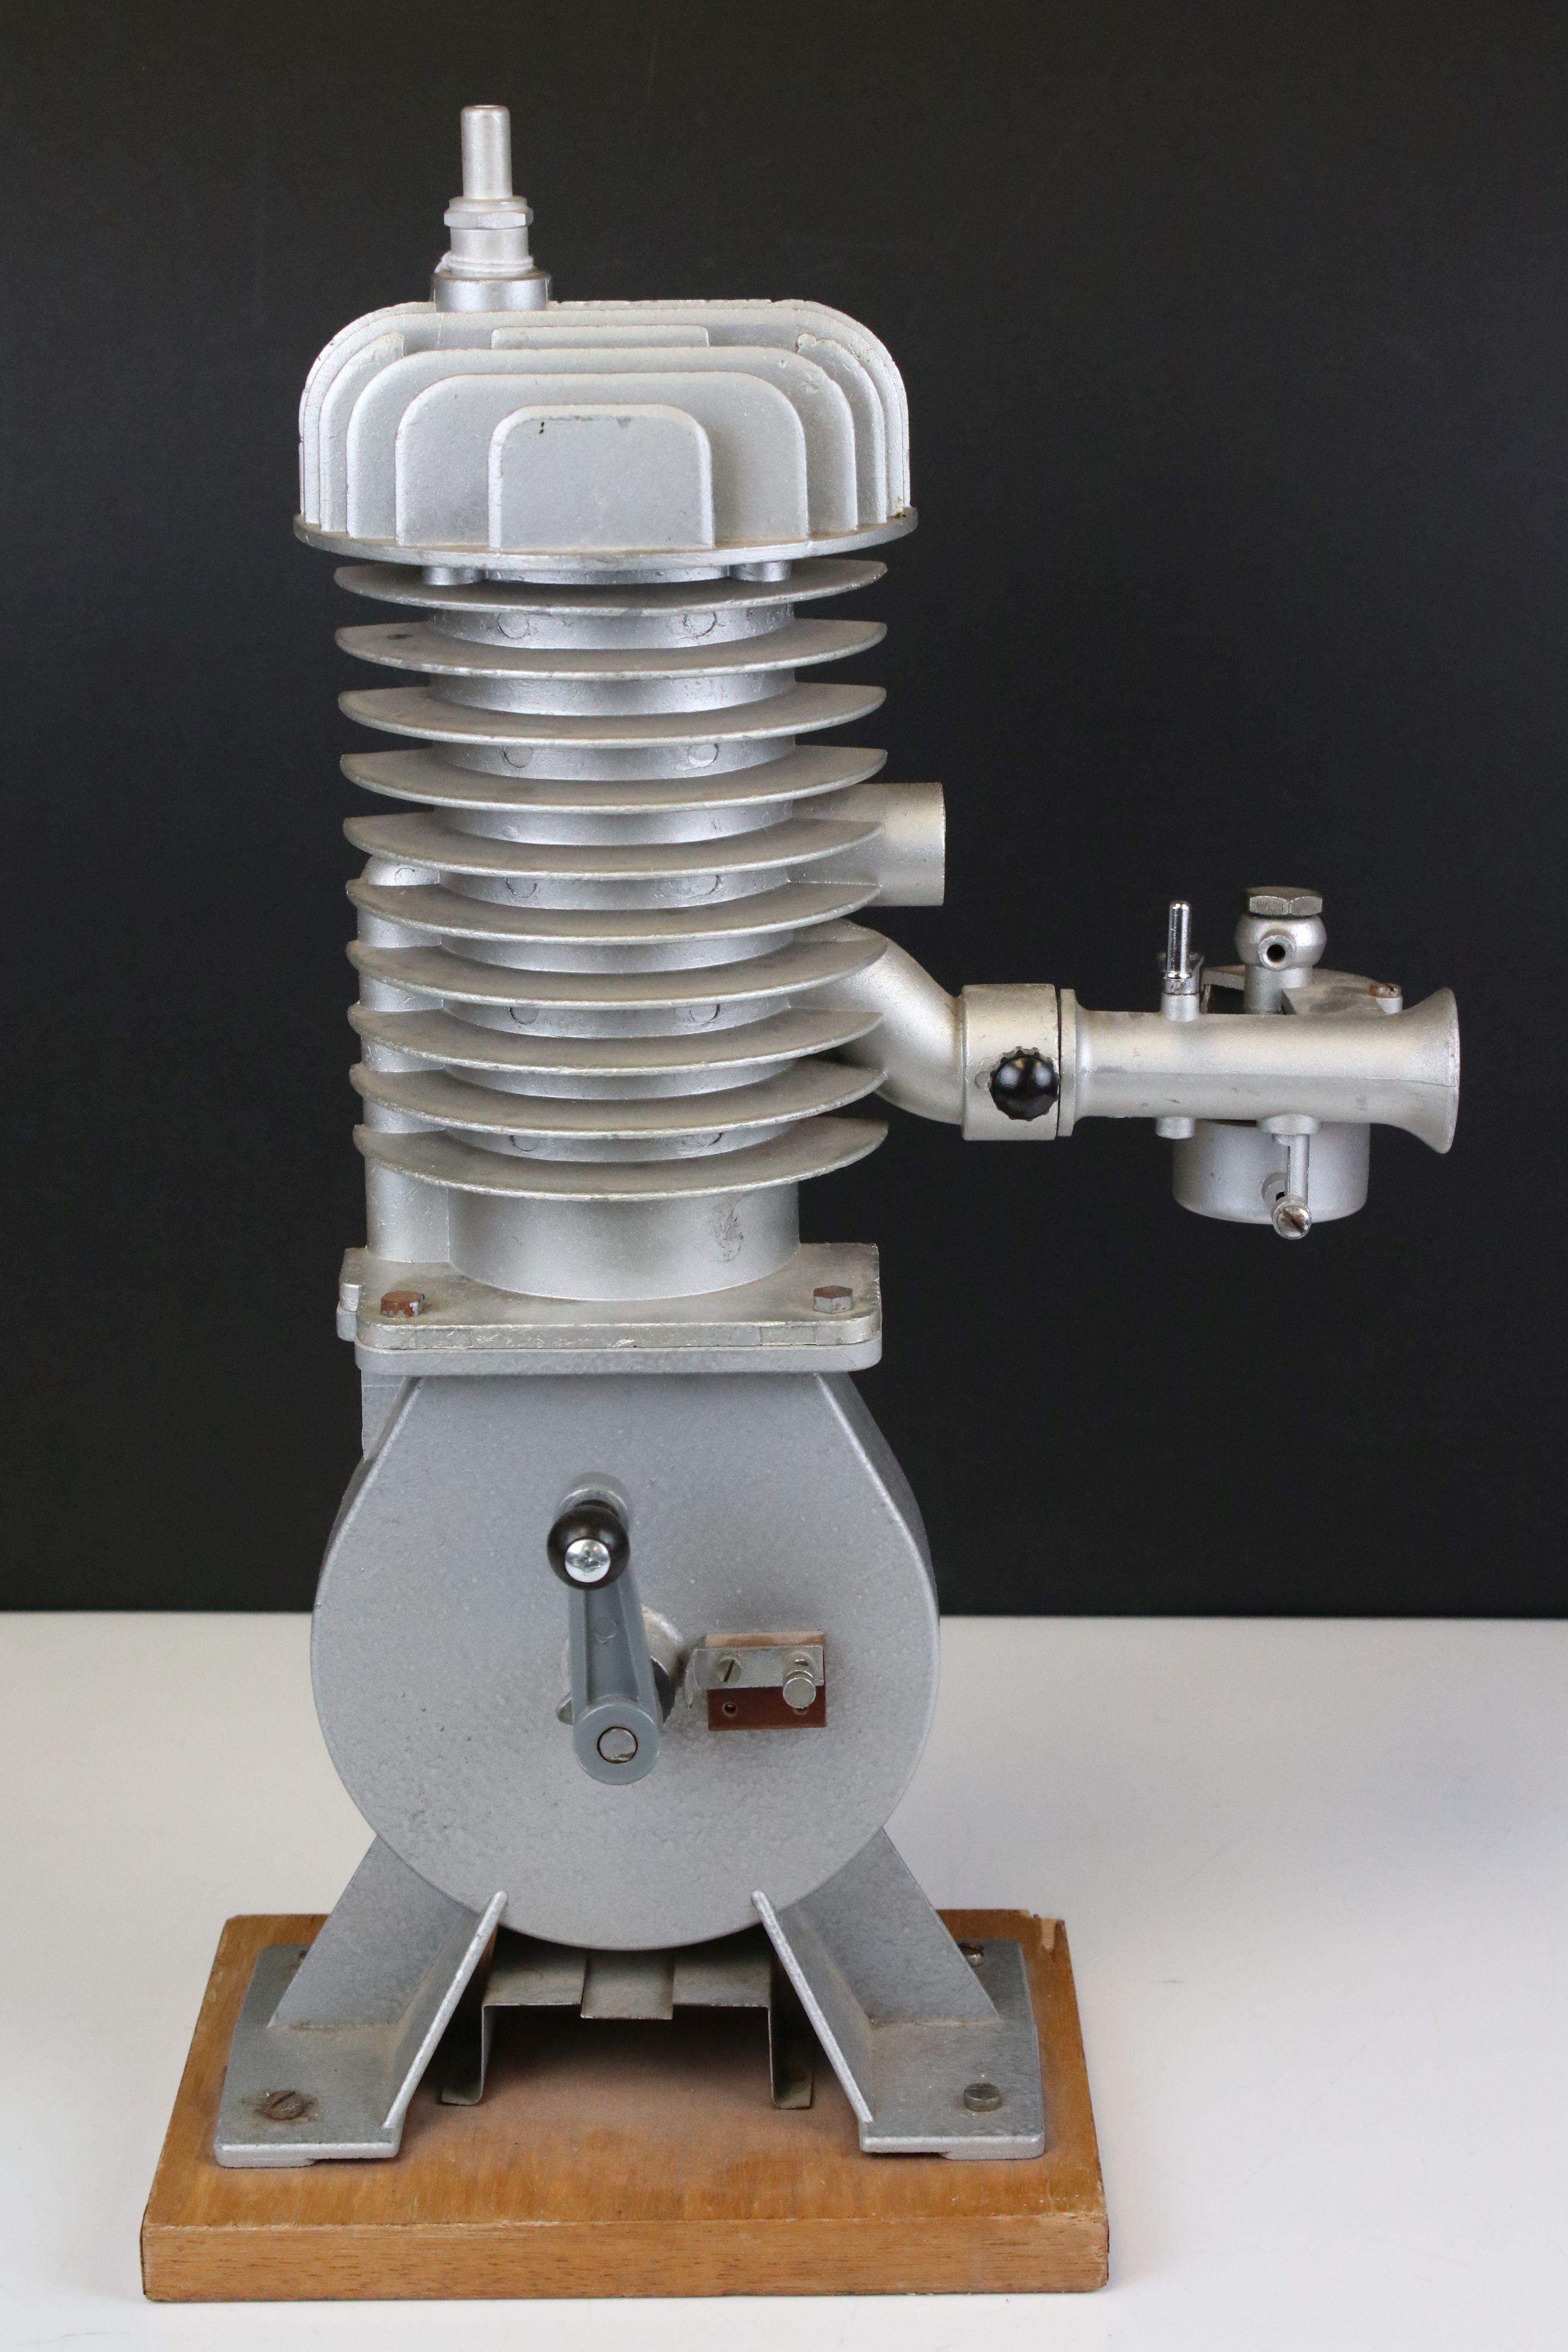 Cast Cut-away Demonstration Model of a Two-stroke Engine by Irwin & Partners Ltd of Croydon, on - Image 2 of 5